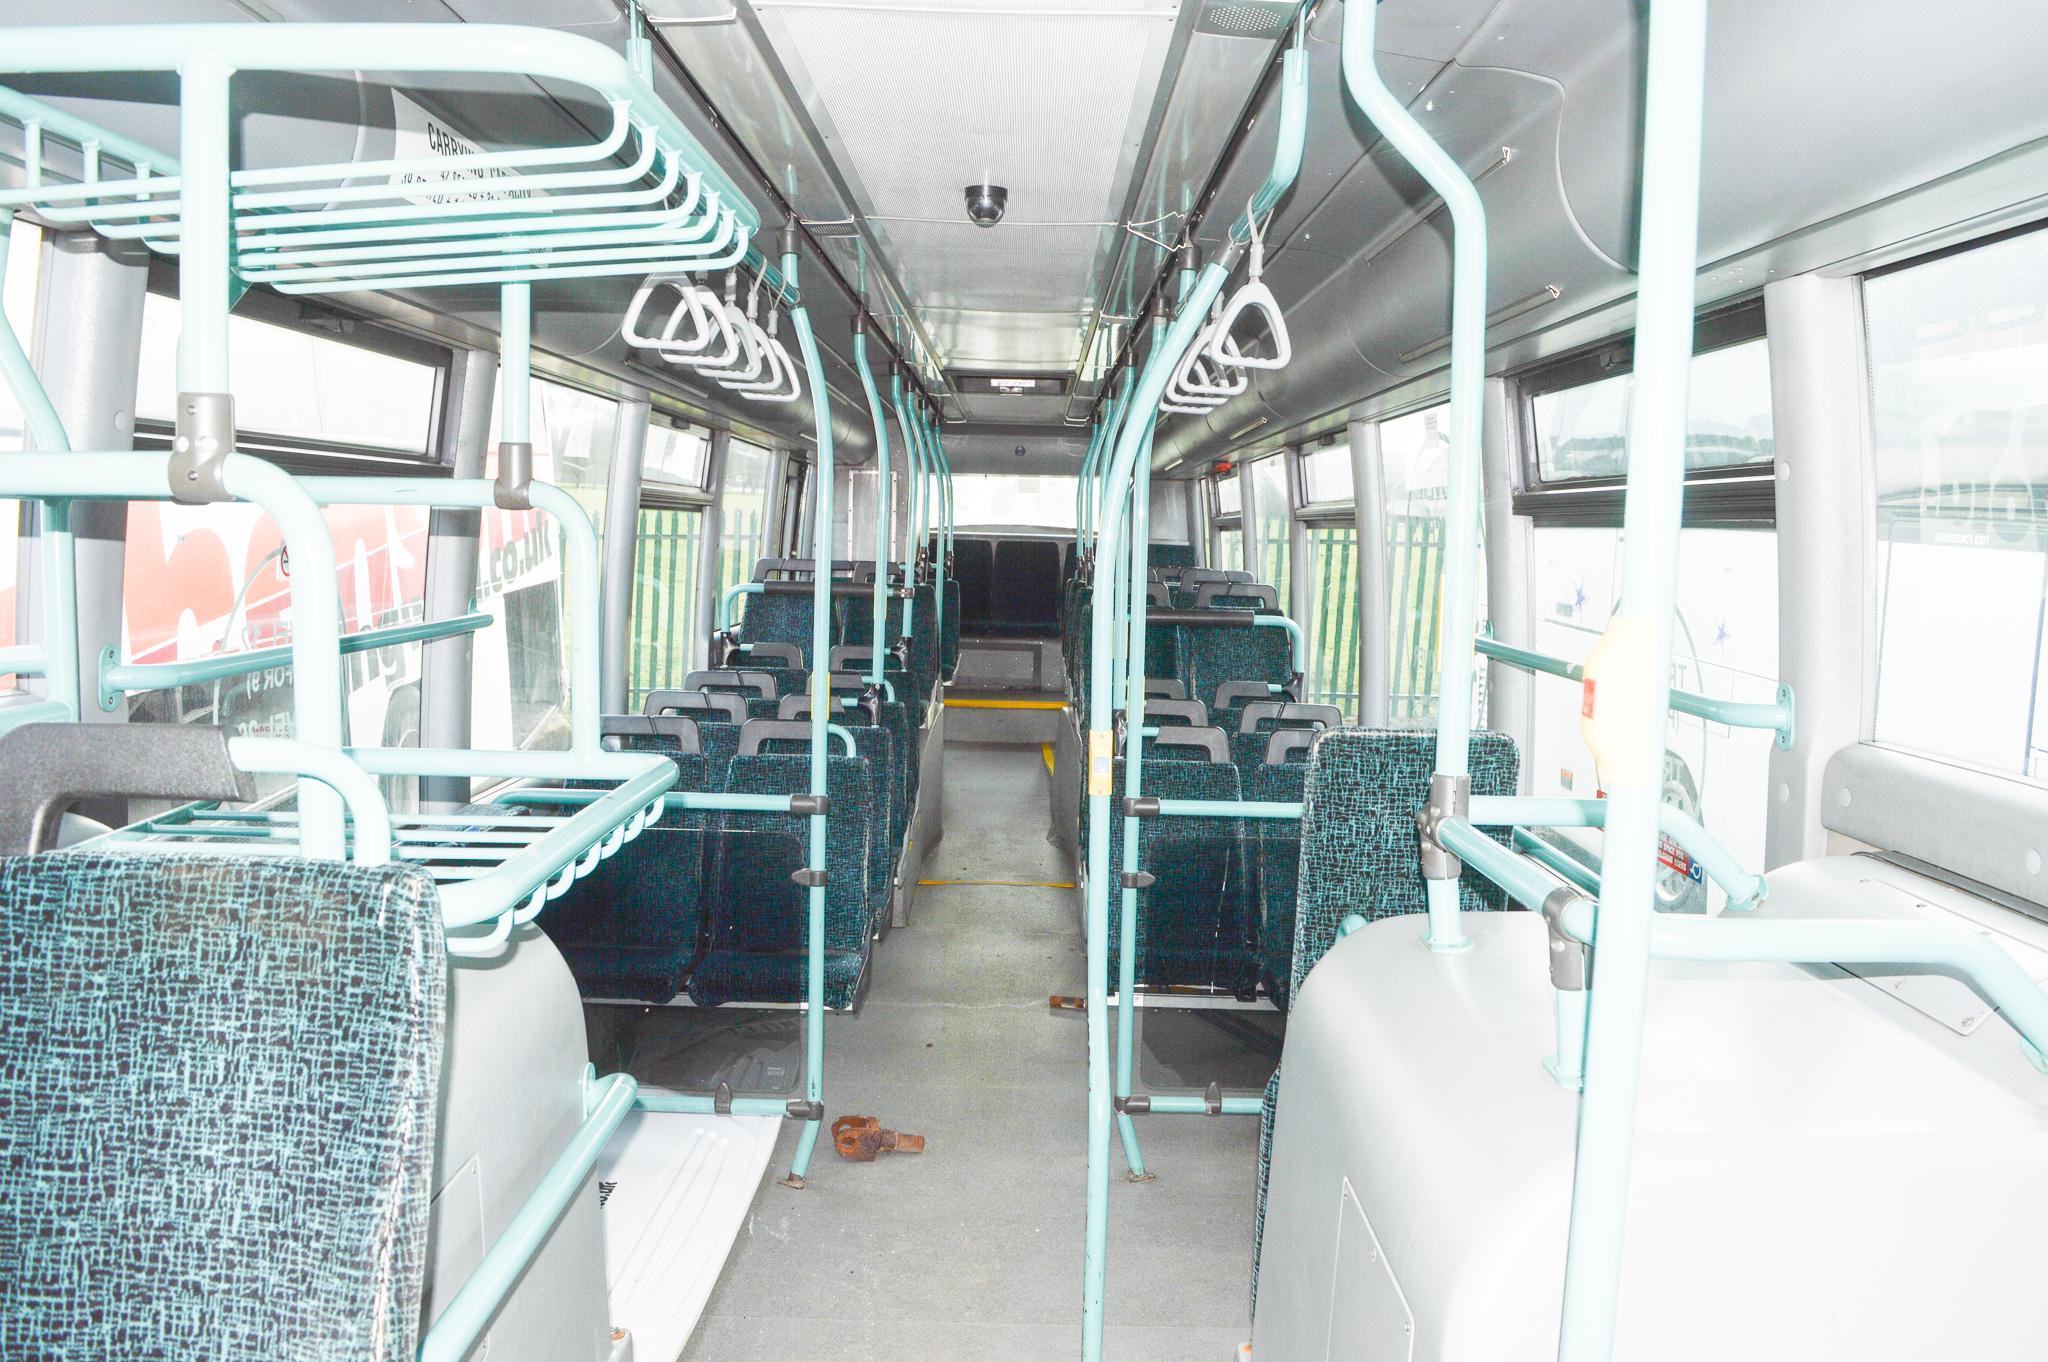 Lot 51 - Scania 42 seat single deck service bus Registration Number: YN03 UWB Date of Registration: 08/04/